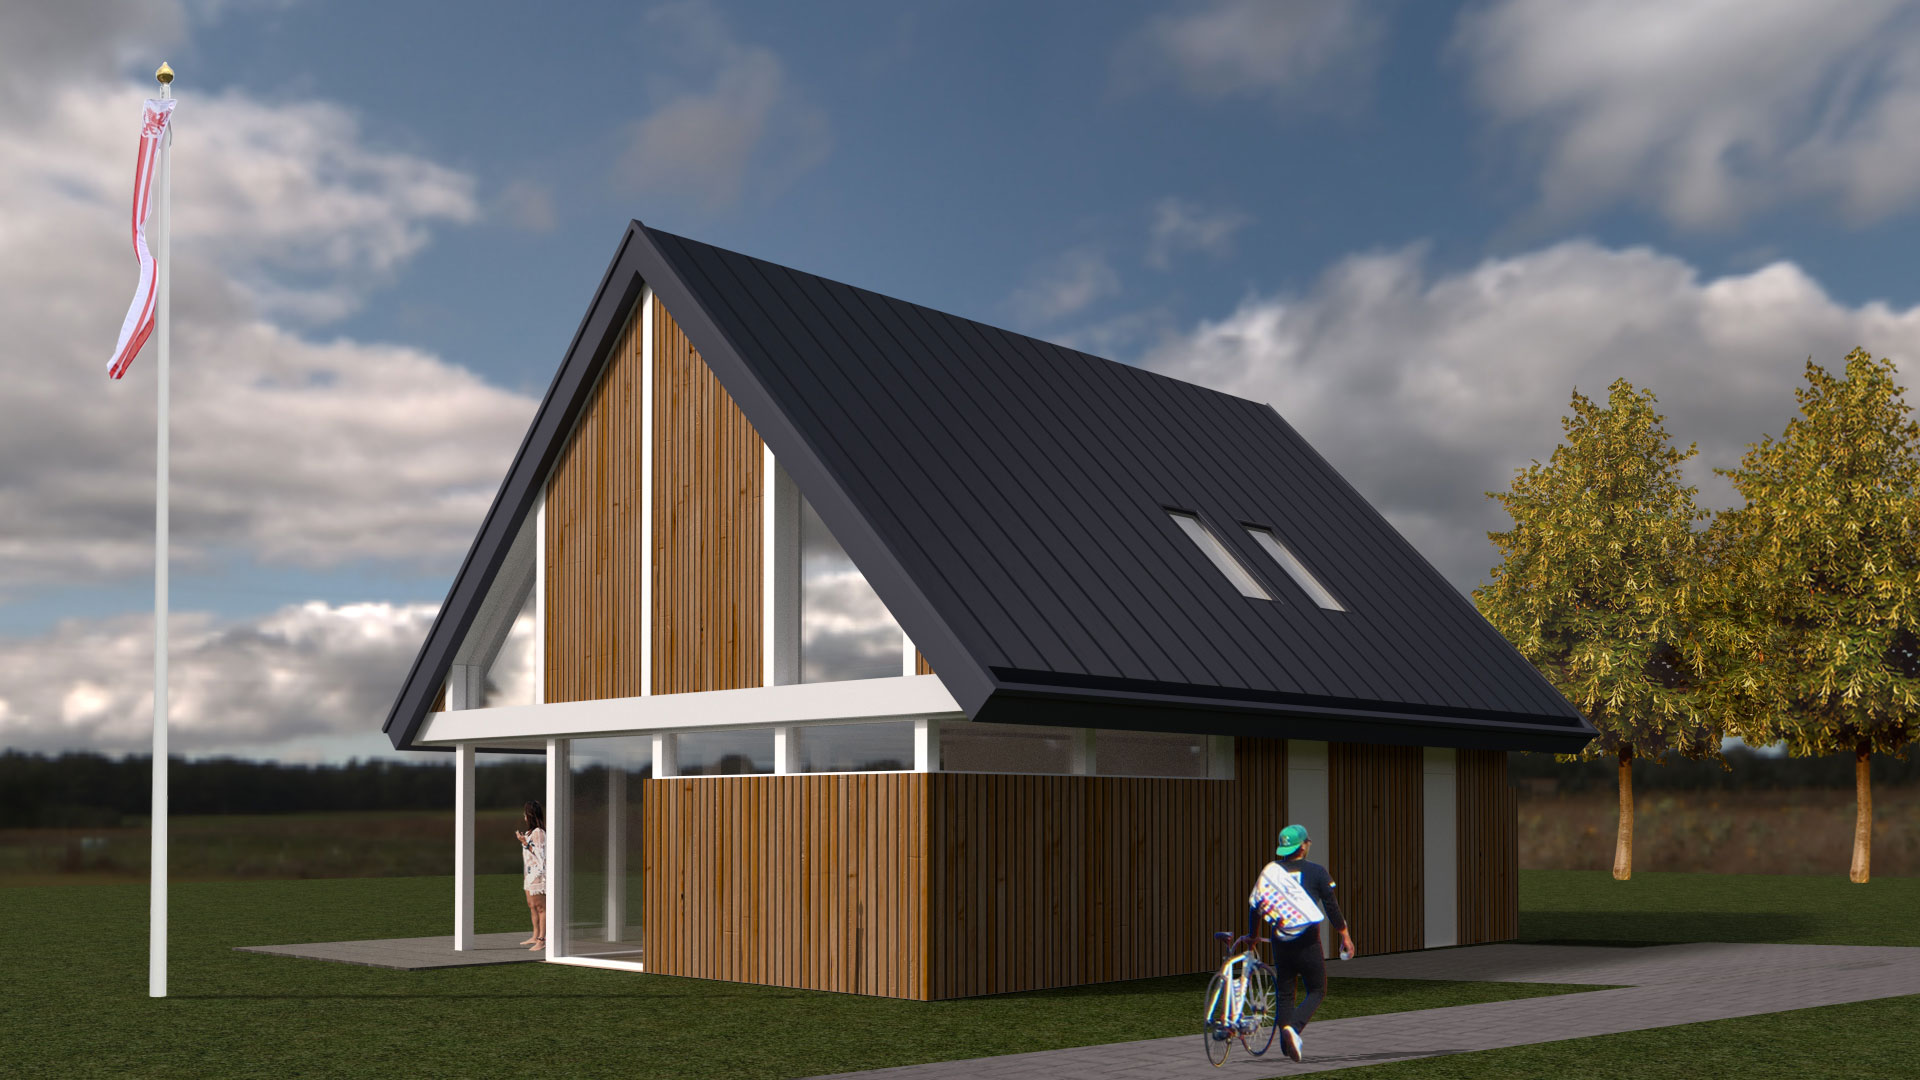 Loft woning bouwen schuurwoning bouwen for Zelf huis bouwen kostprijs